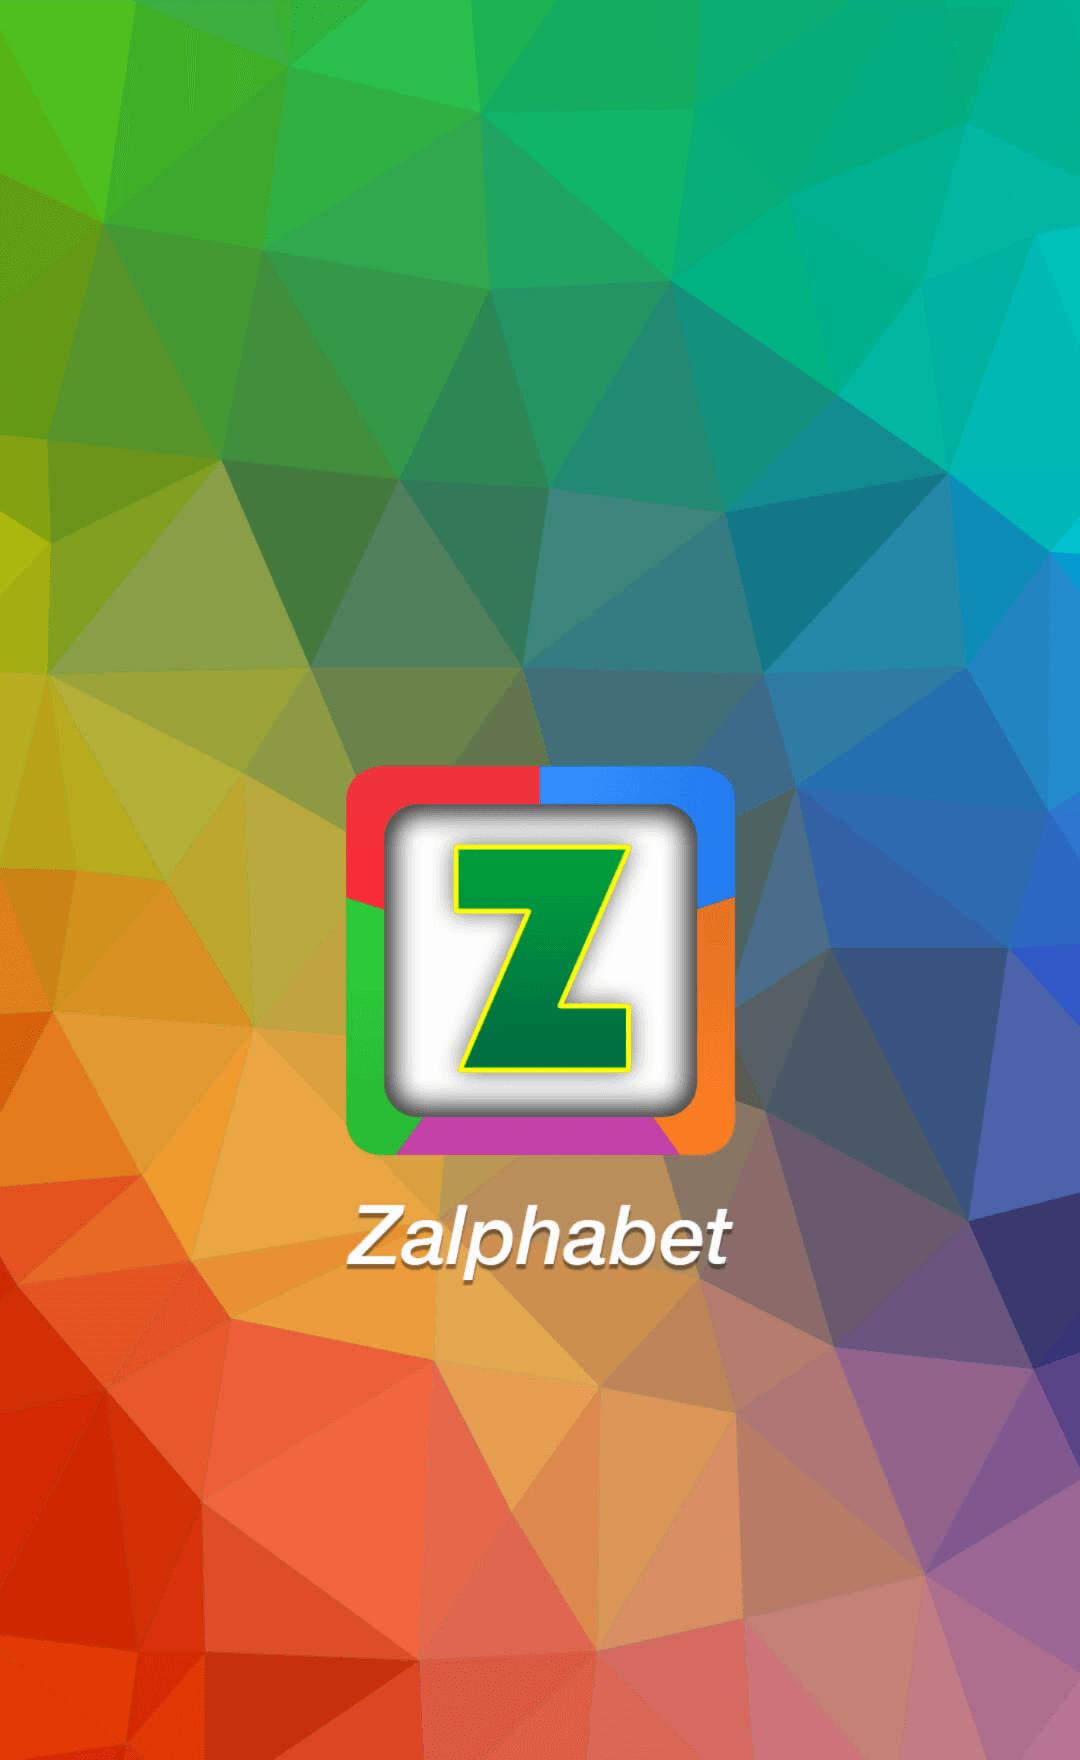 zalphabet